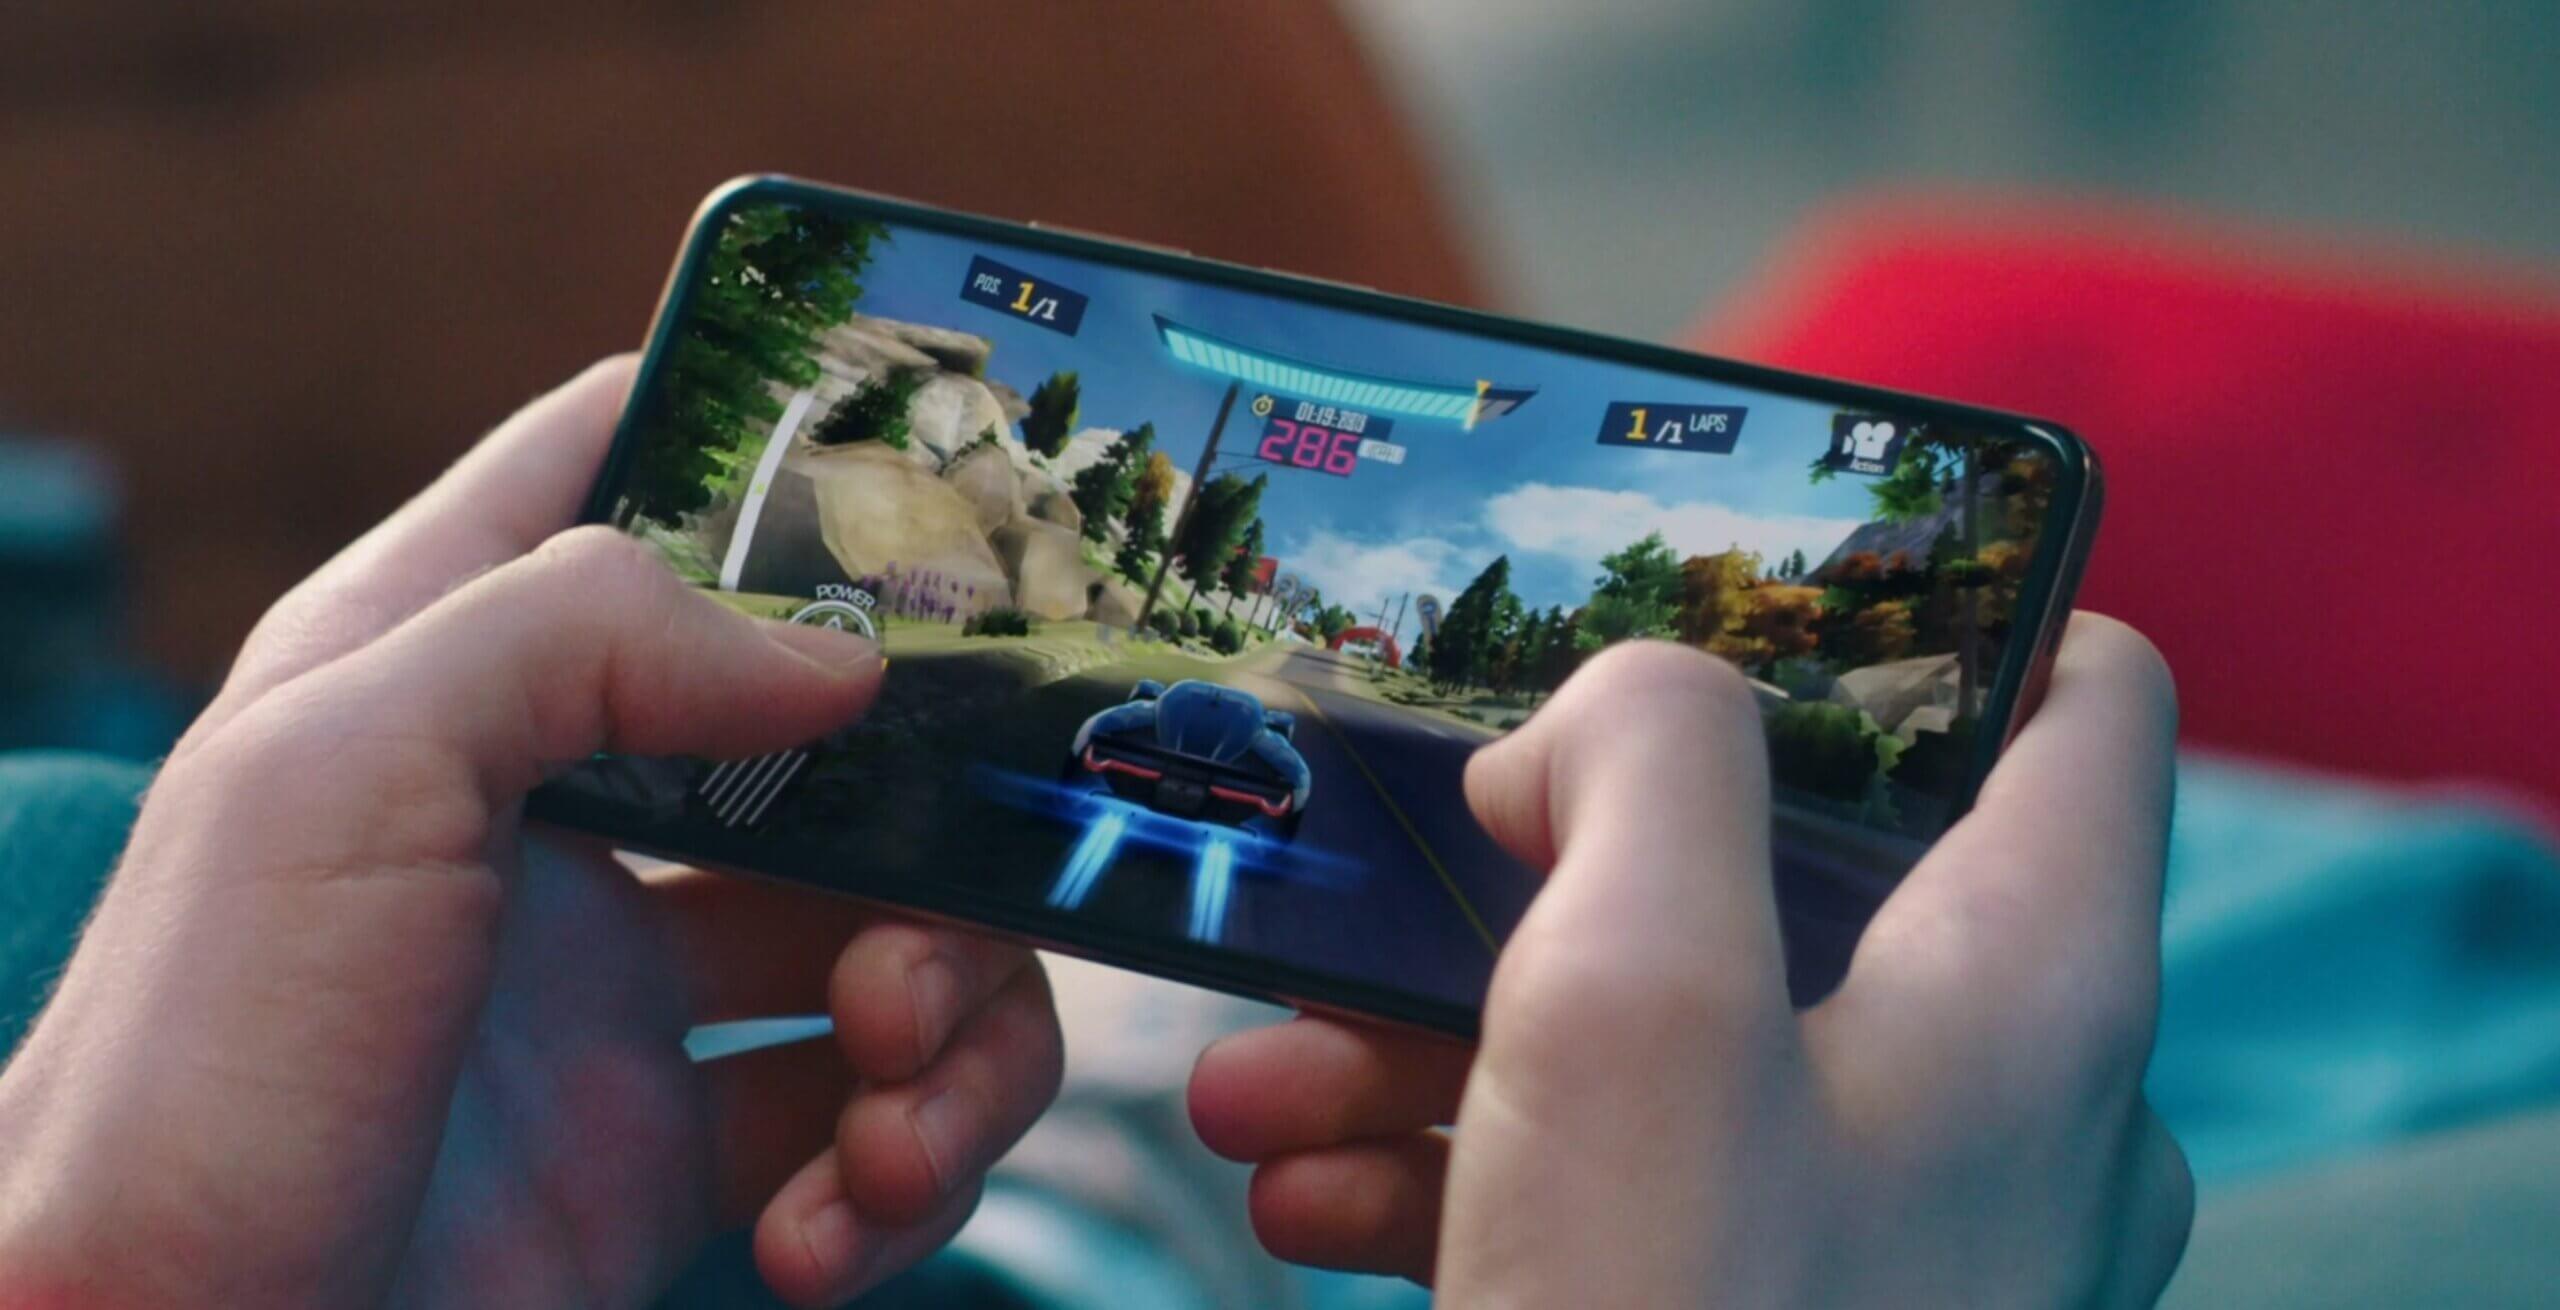 Redmi Note 10 Proは240Hzのタッチサンプリングレートに対応。FPSなどのゲームを優位に戦える